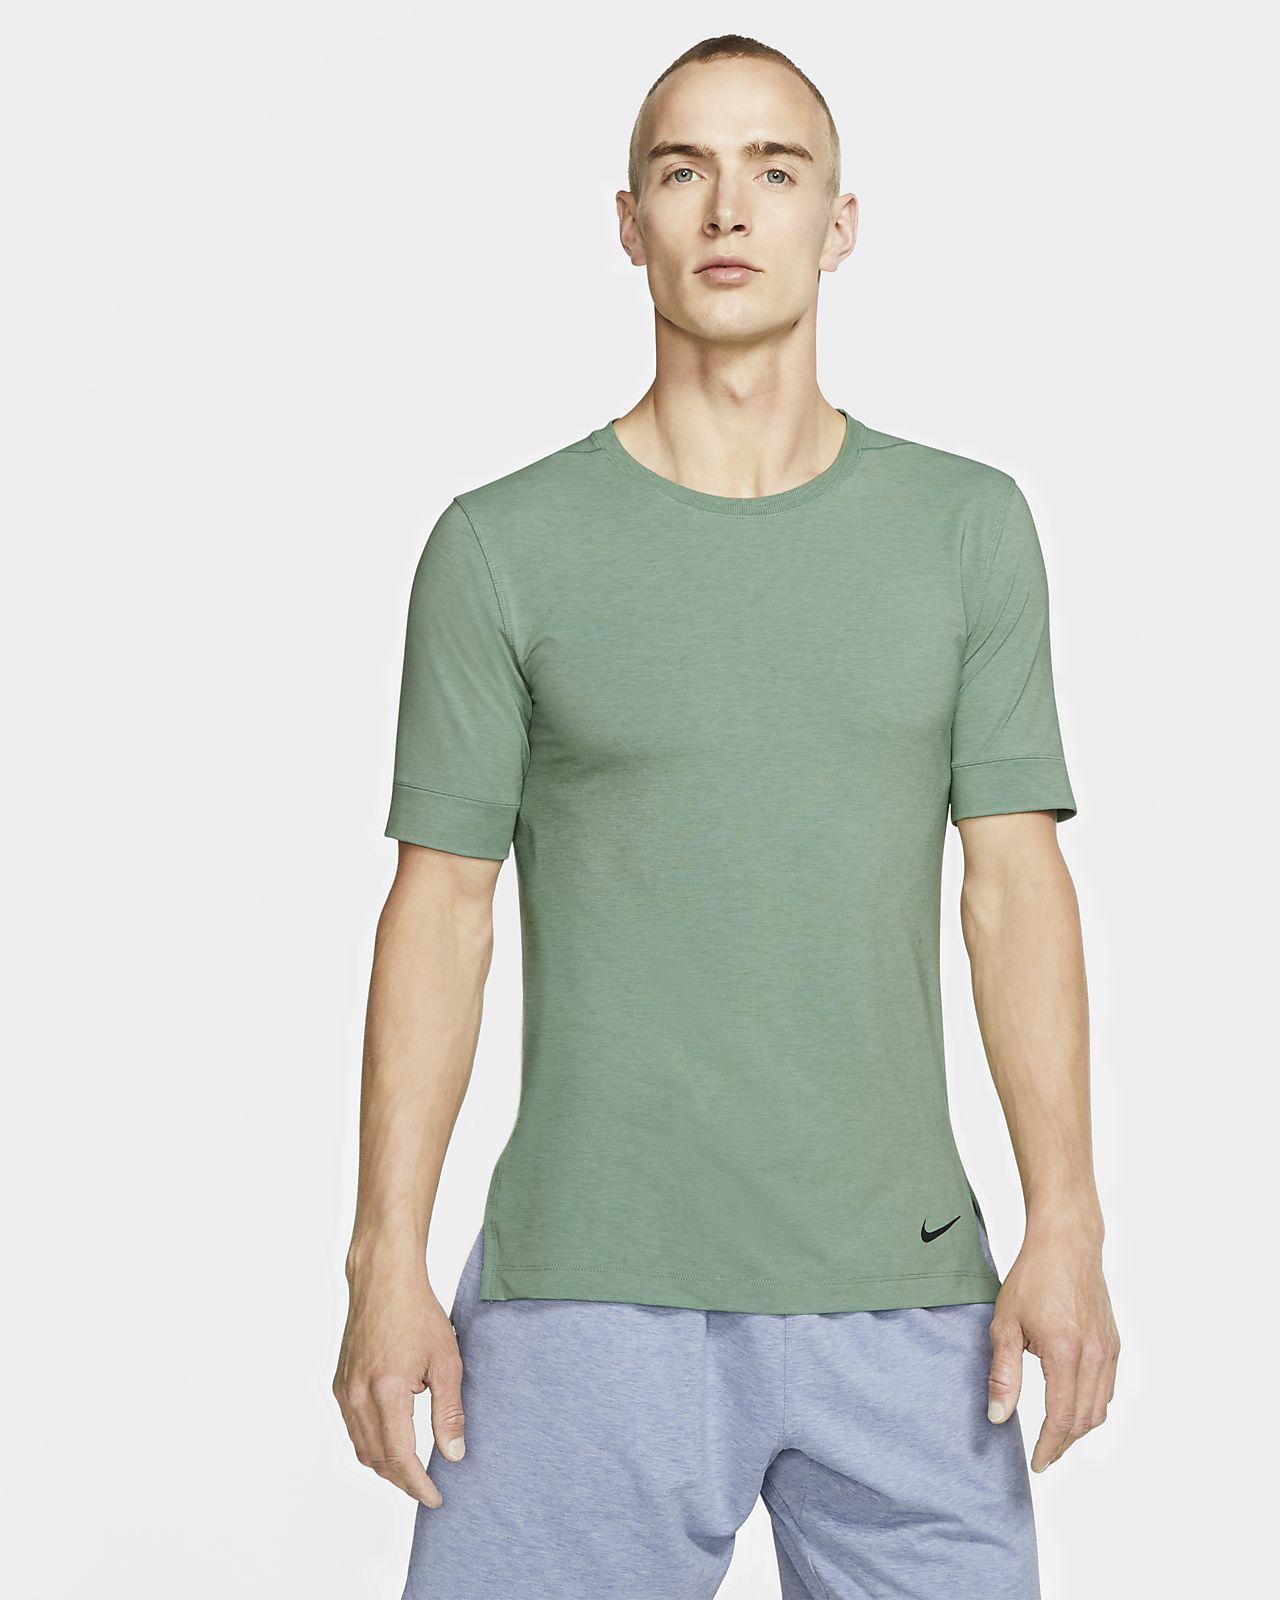 nike yoga shirt